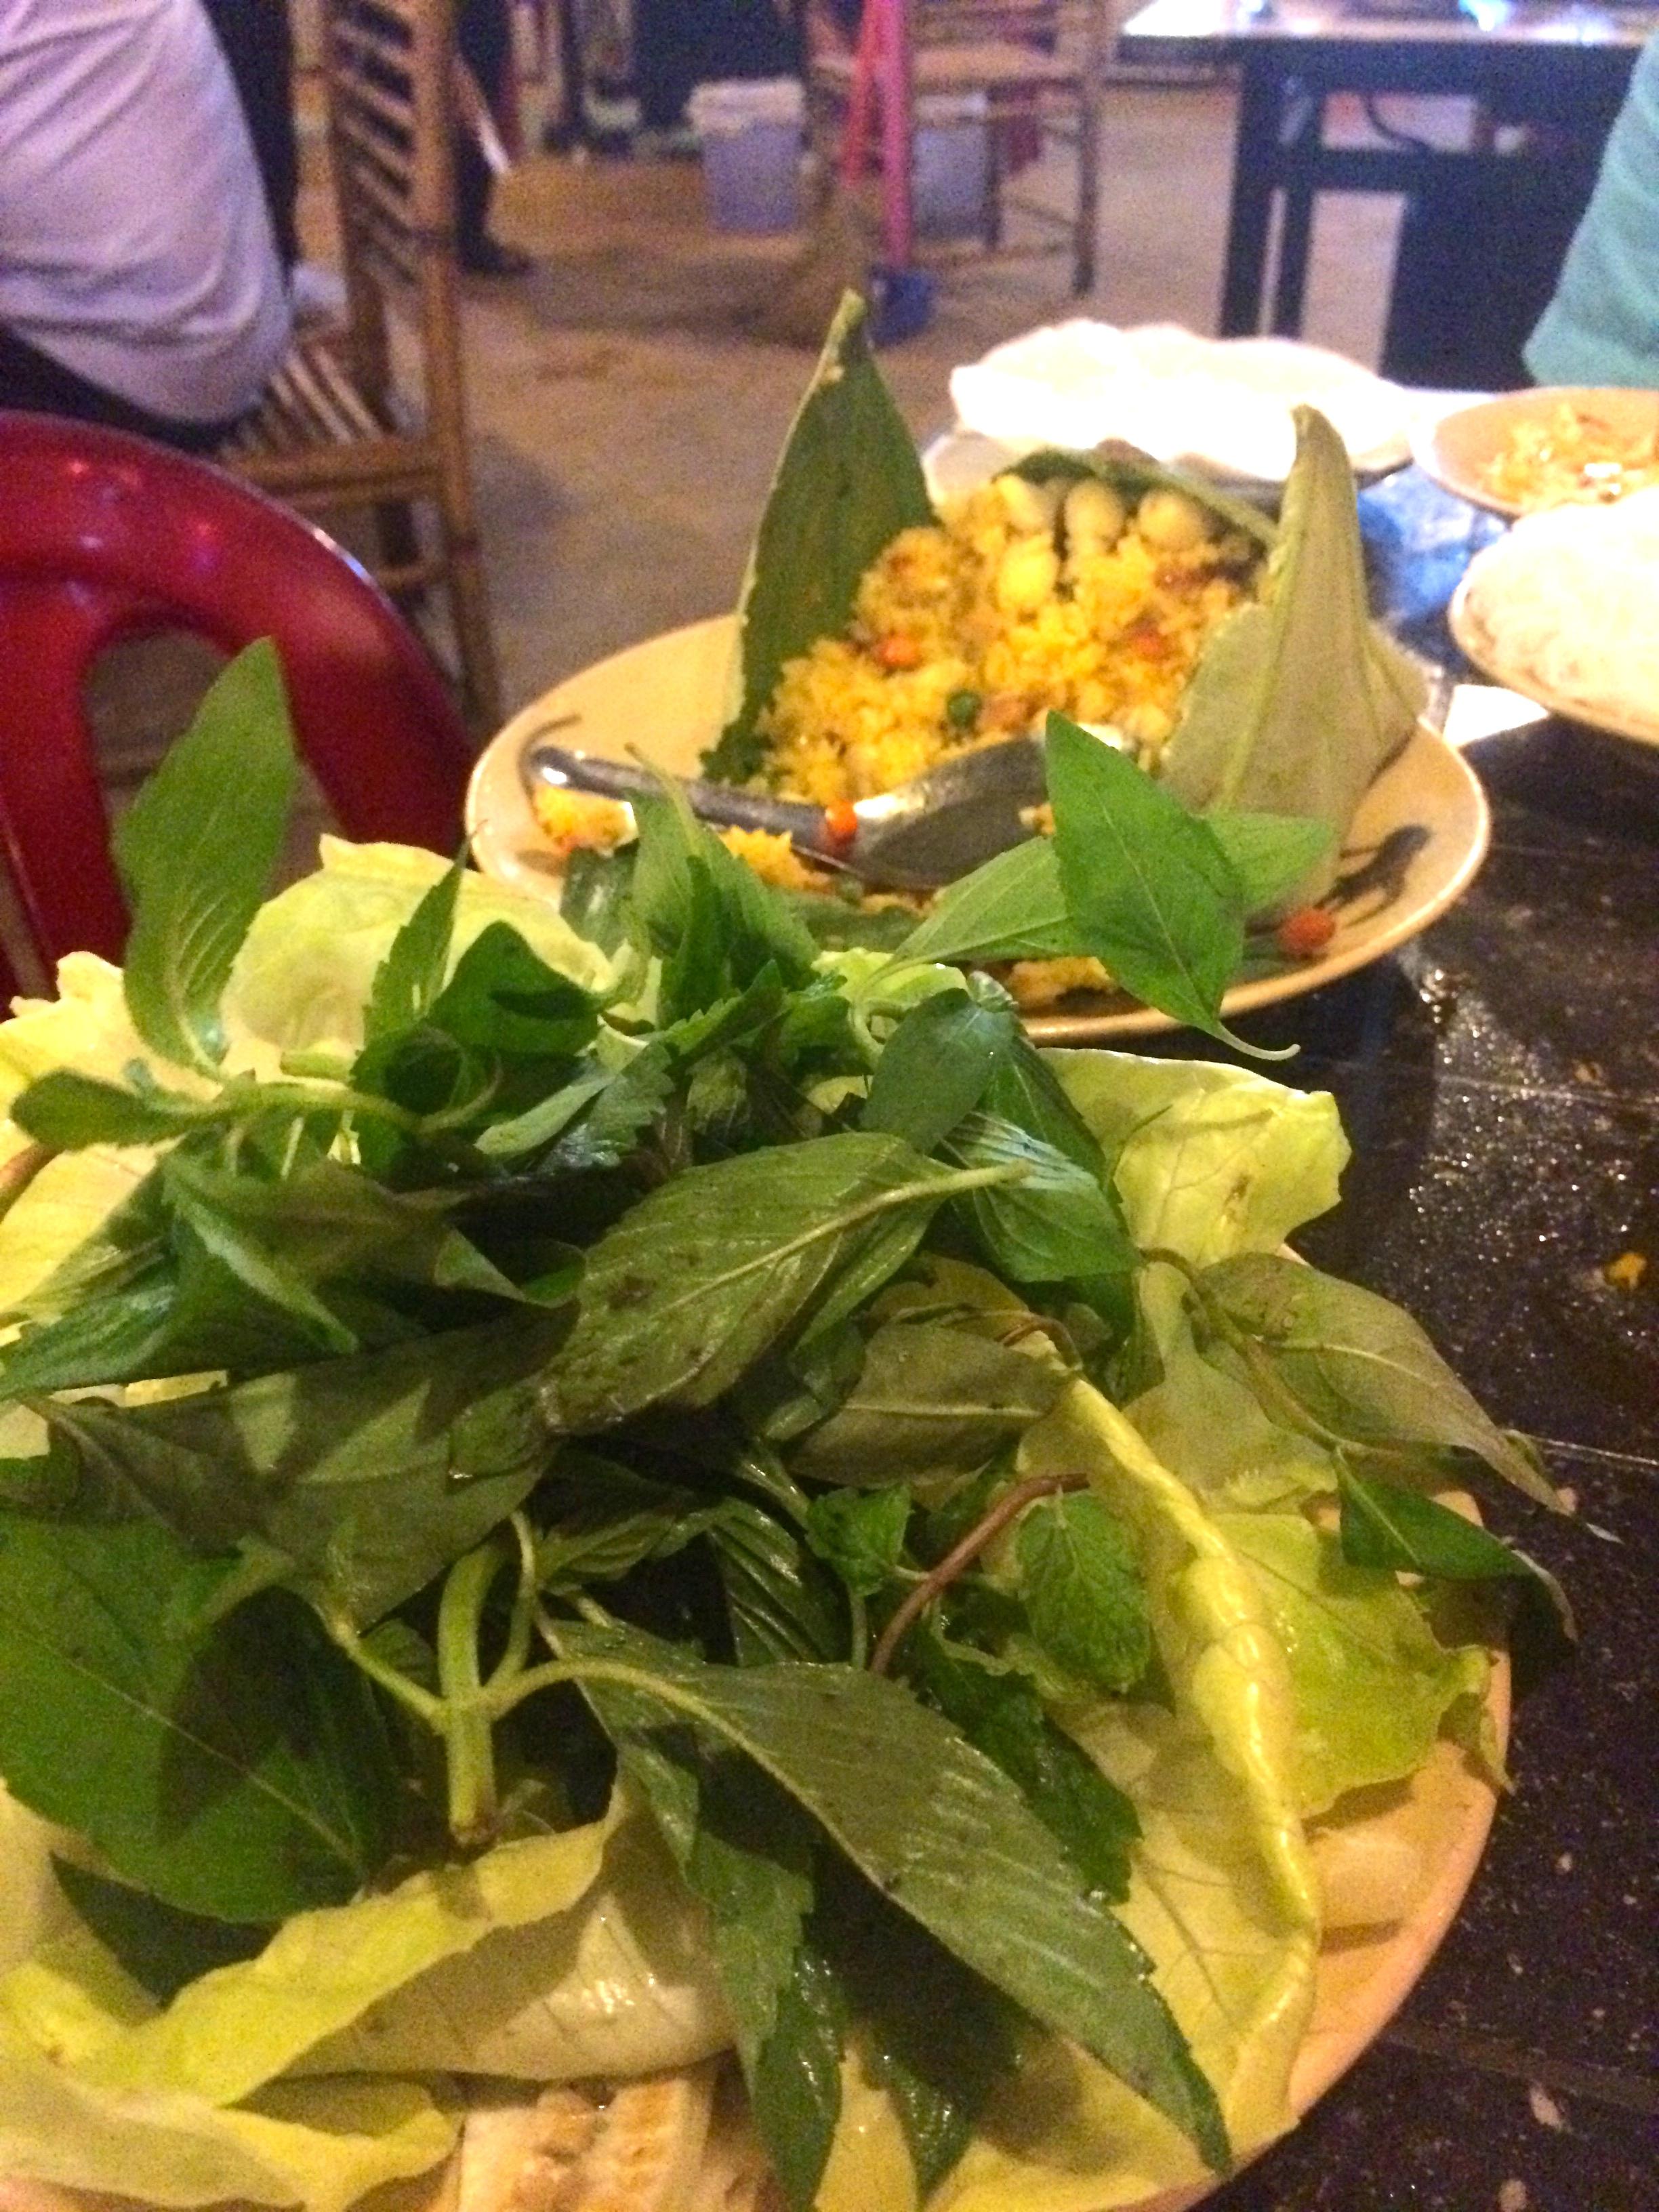 Vietnamese Herbs, Green Bananas and Cucumbers